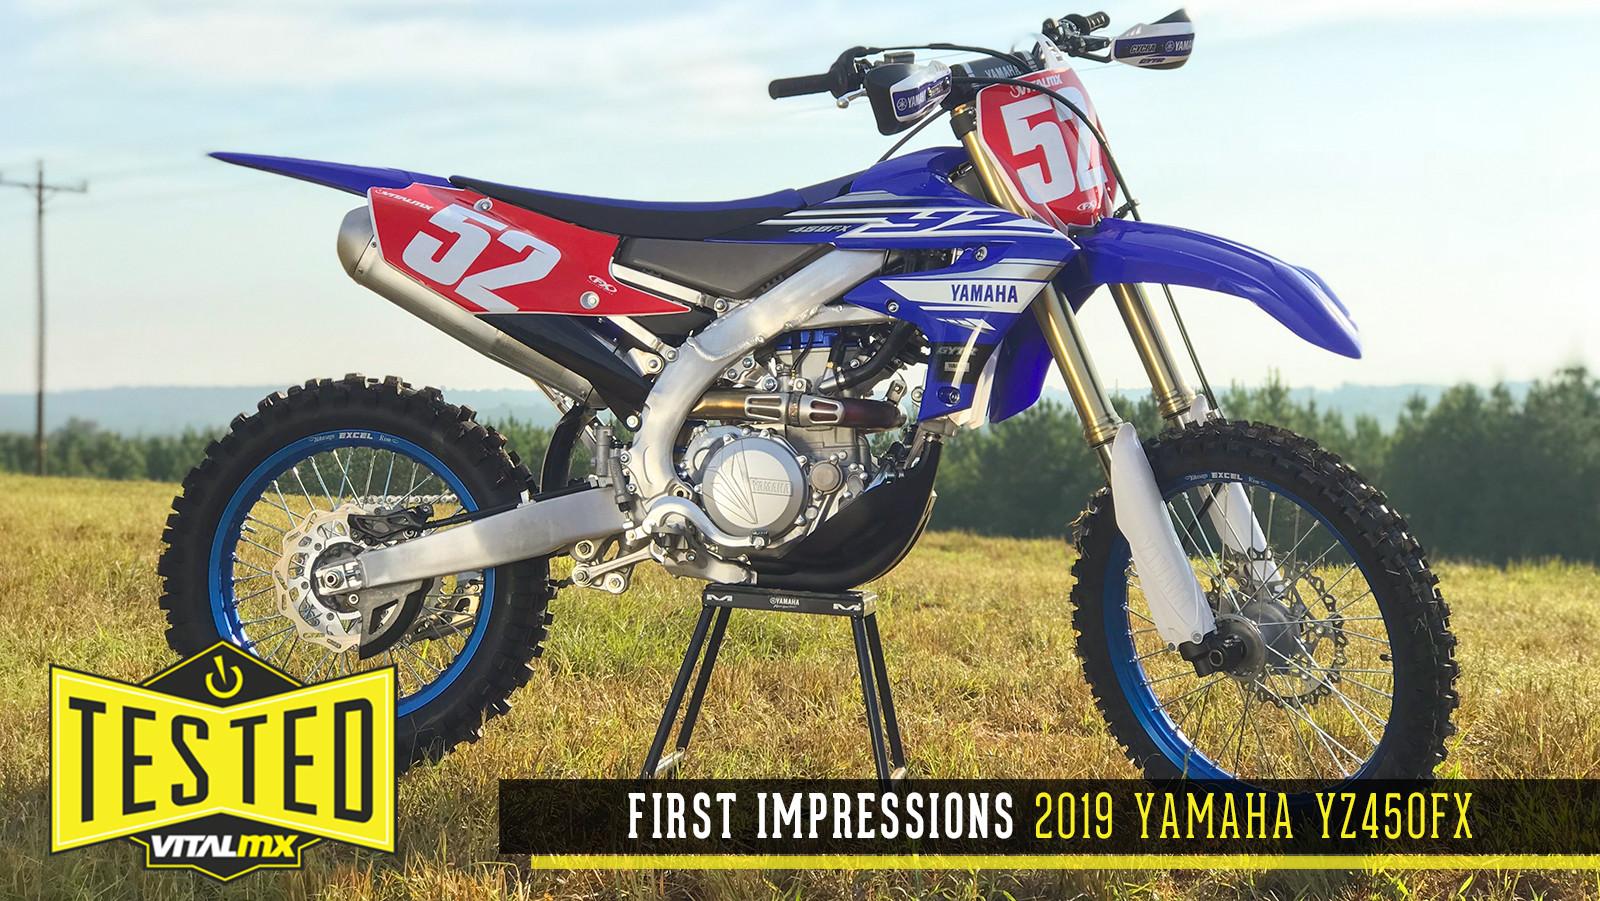 First Impressions: 2019 Yamaha YZ450FX